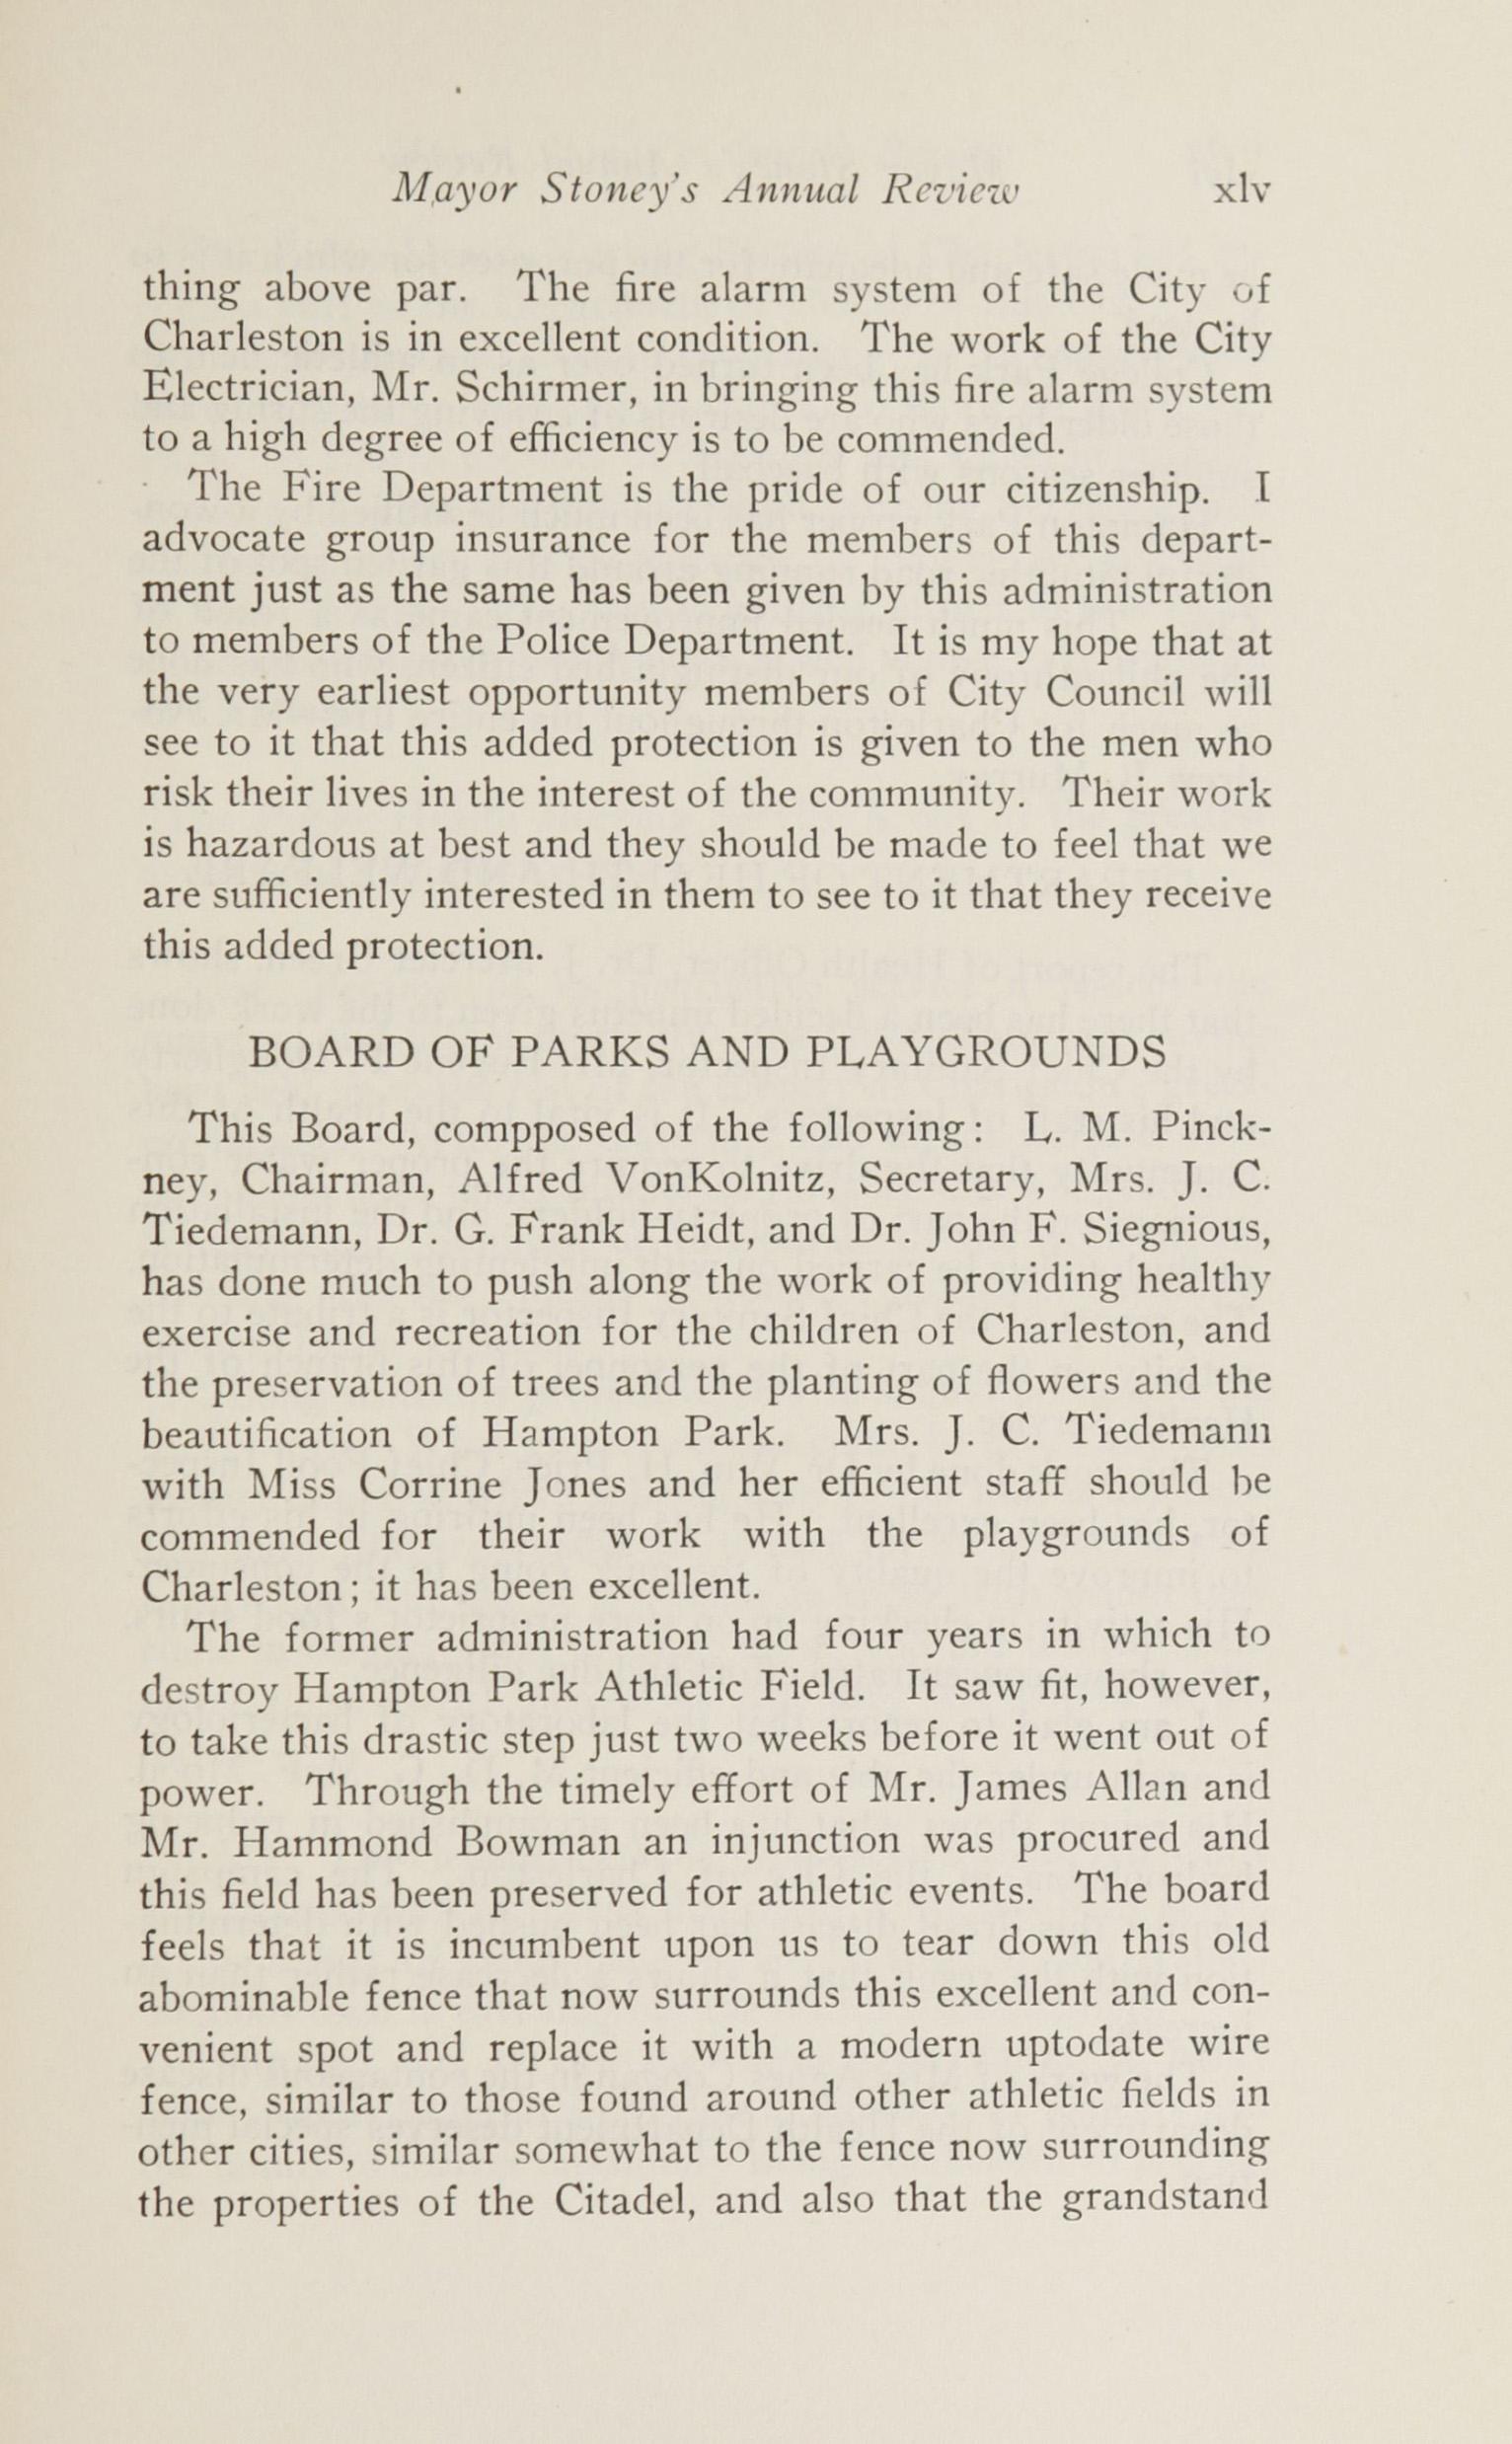 Charleston Yearbook, 1924, page xlv